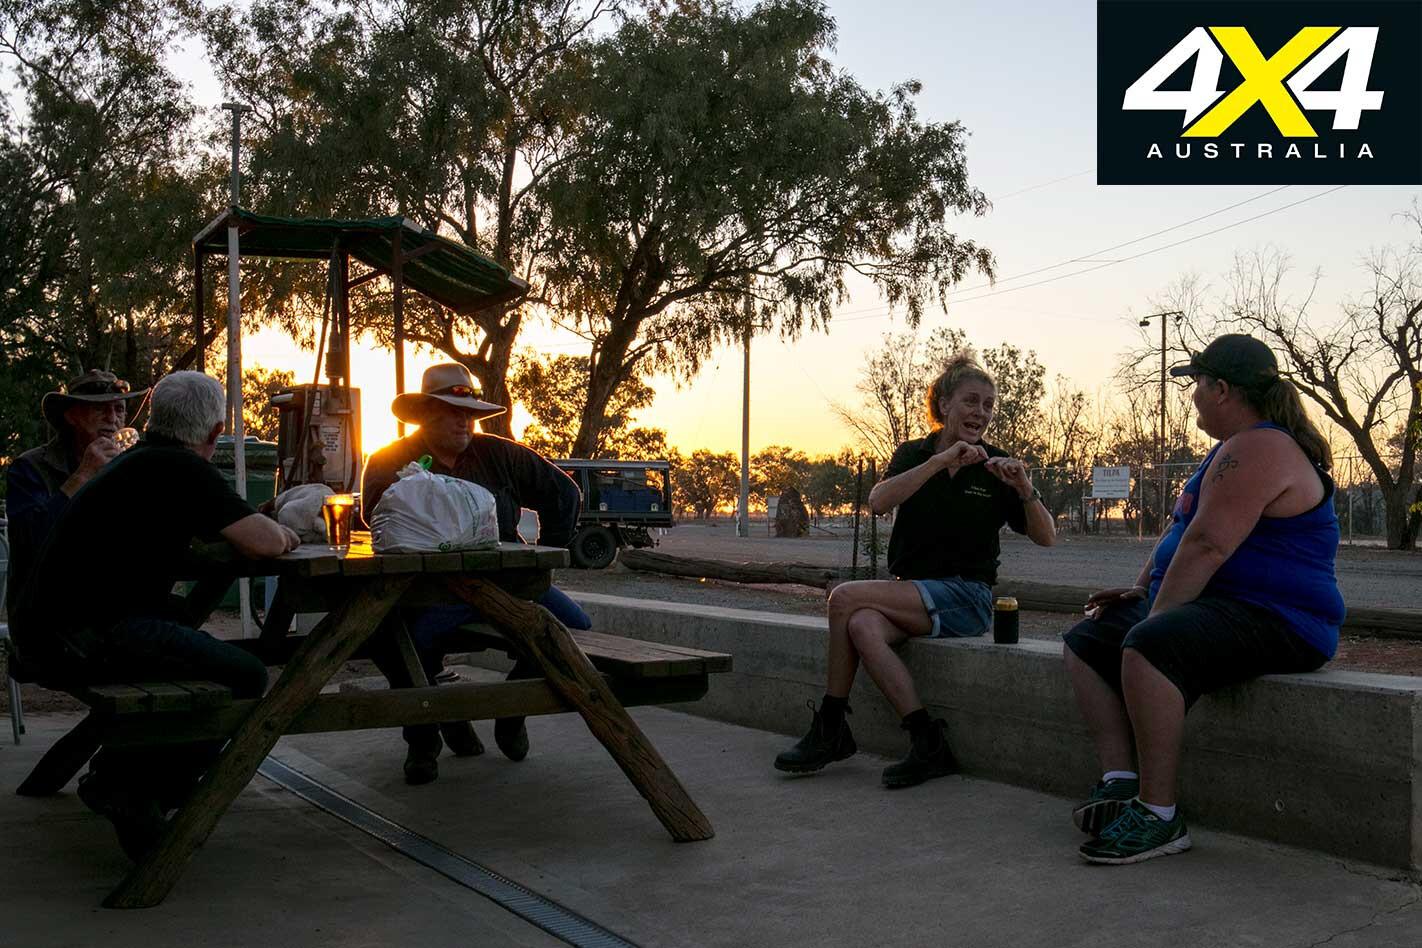 4 X 4 Pubs Tilpa Hotel NSW Sunset Jpg